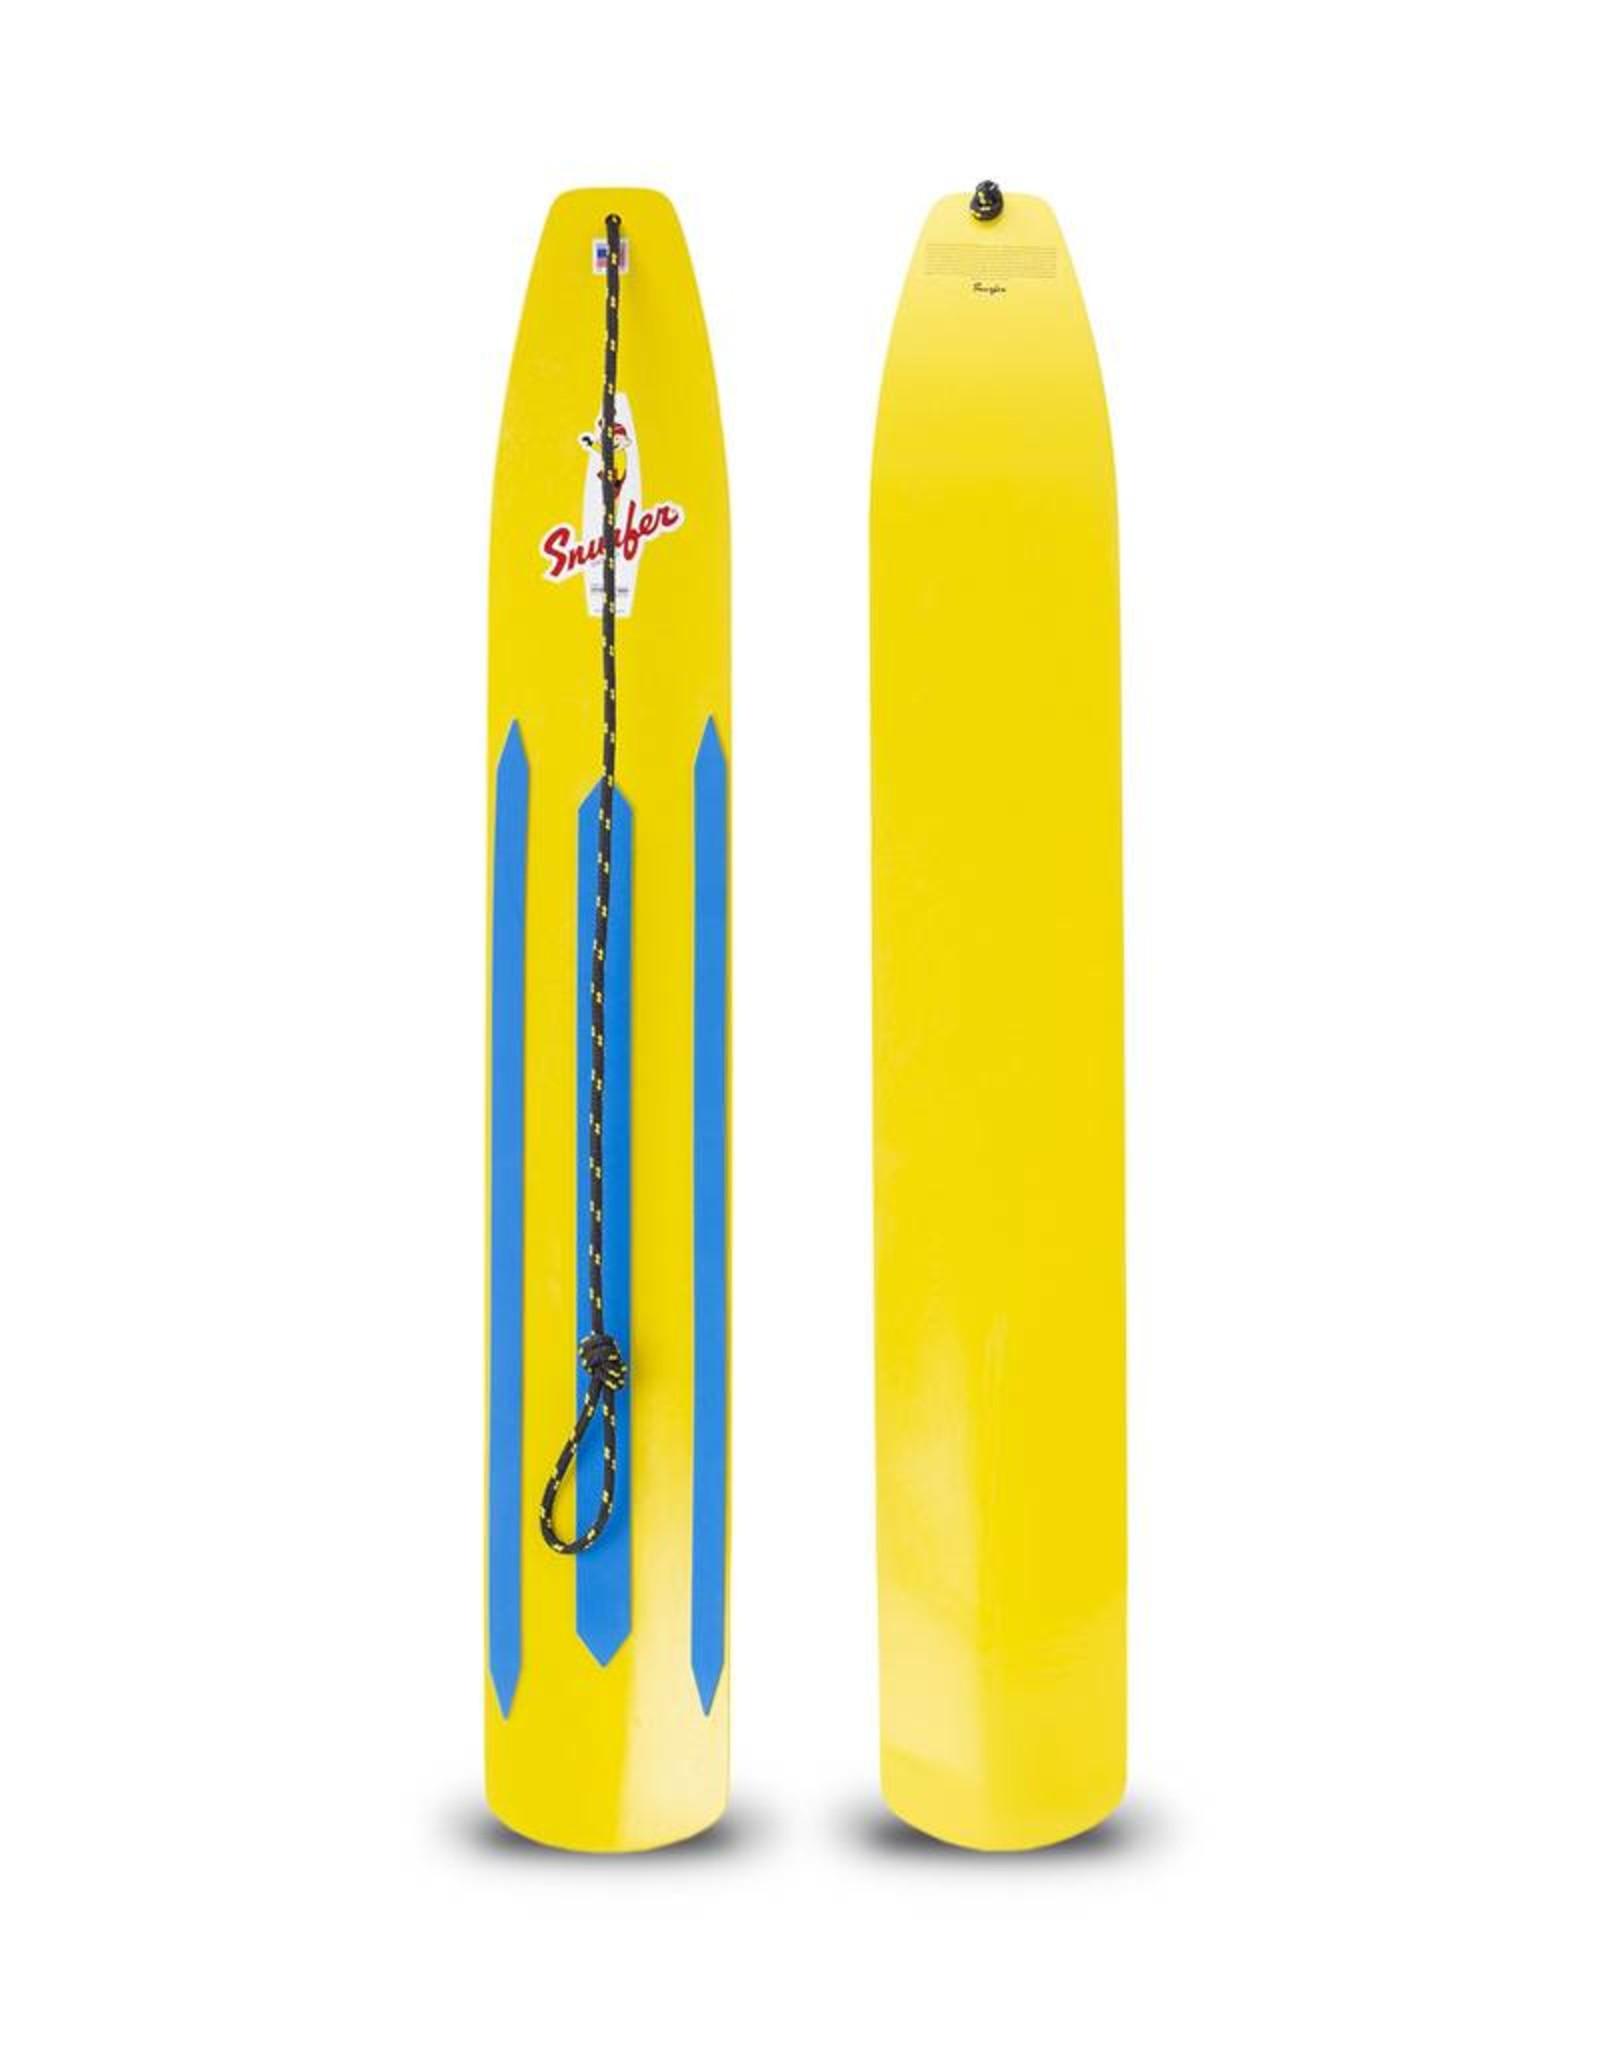 Snurfer Snurfer The Classic Rocket Snow Surfer Yellow